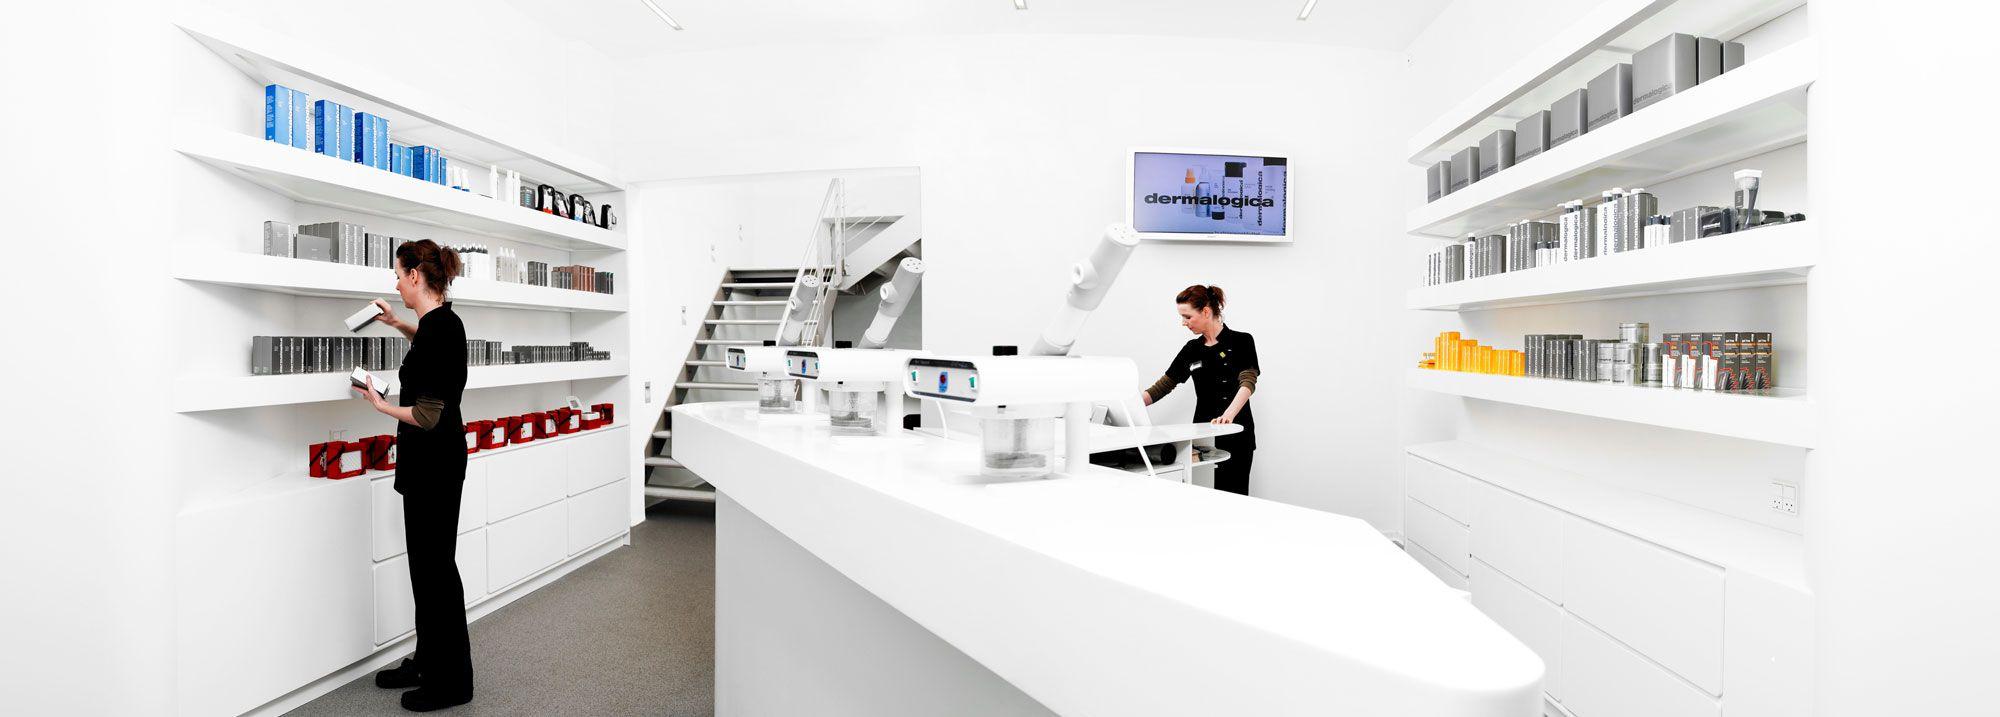 Krads Dermalogica Skin Bar Clinic Dermalogica Dynamic Purity Design